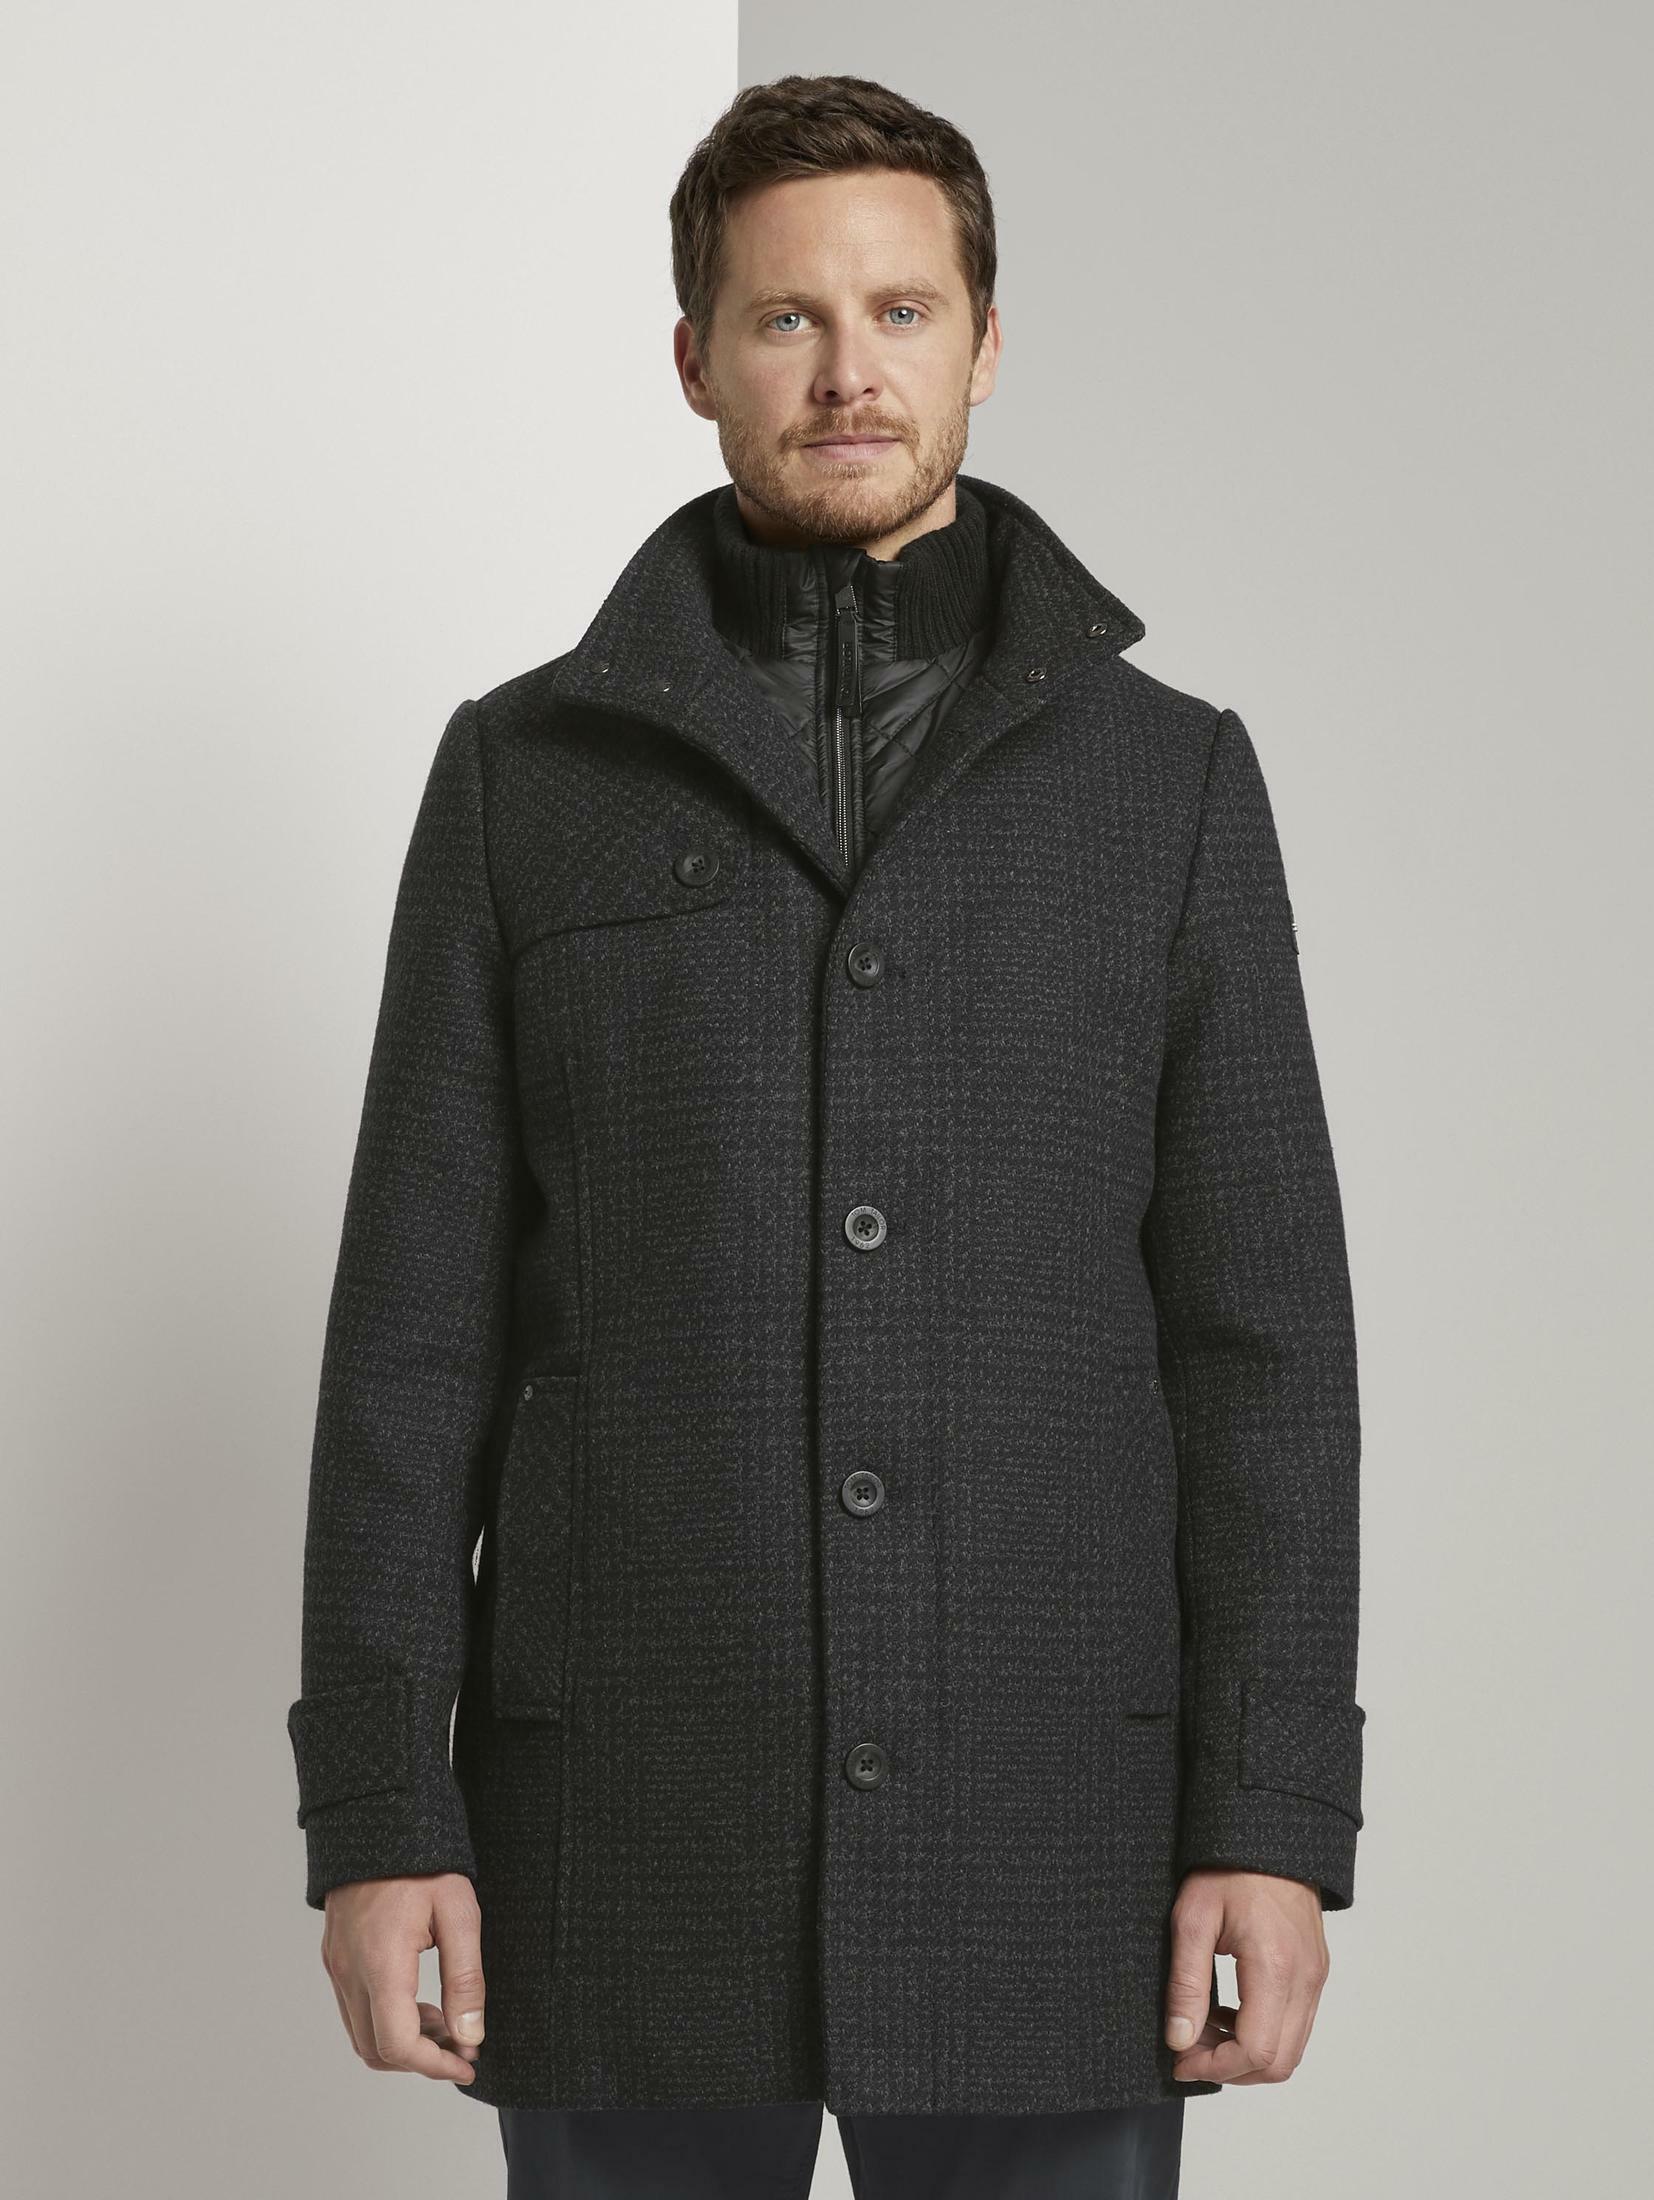 tom tailor -  Dufflecoat Wollmantel mit gesteppter Unterjacke